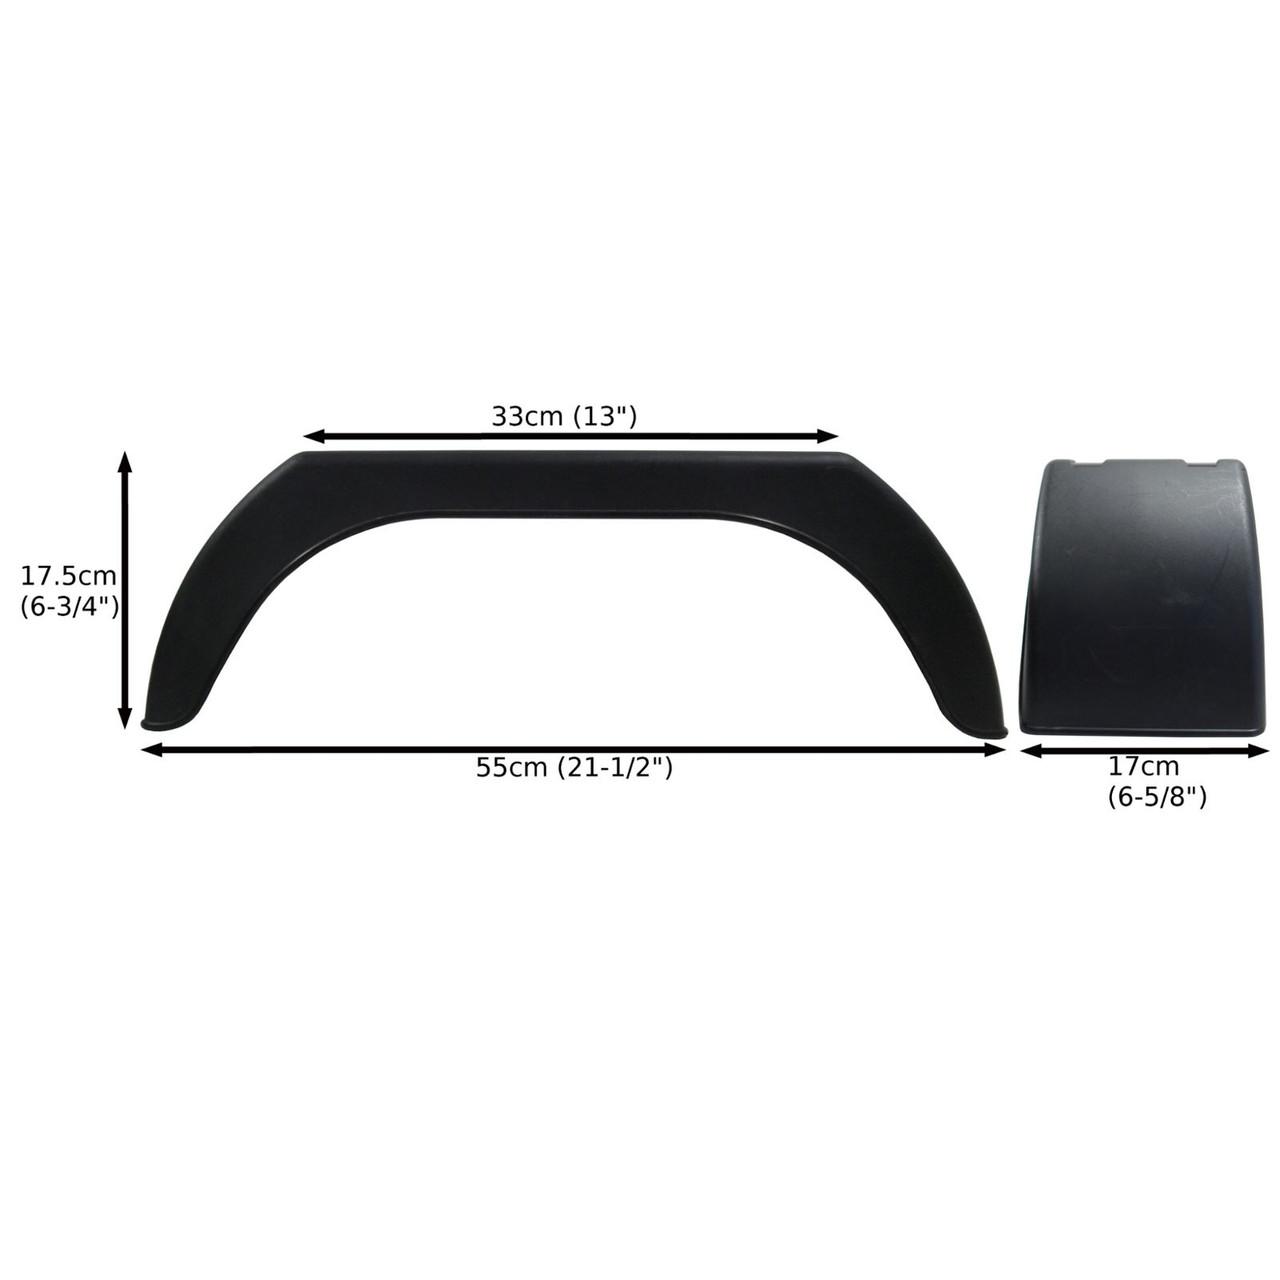 "Fender TR003 Wing Mudguard for Trailer Wheels 13/"" Plastic PAIR"